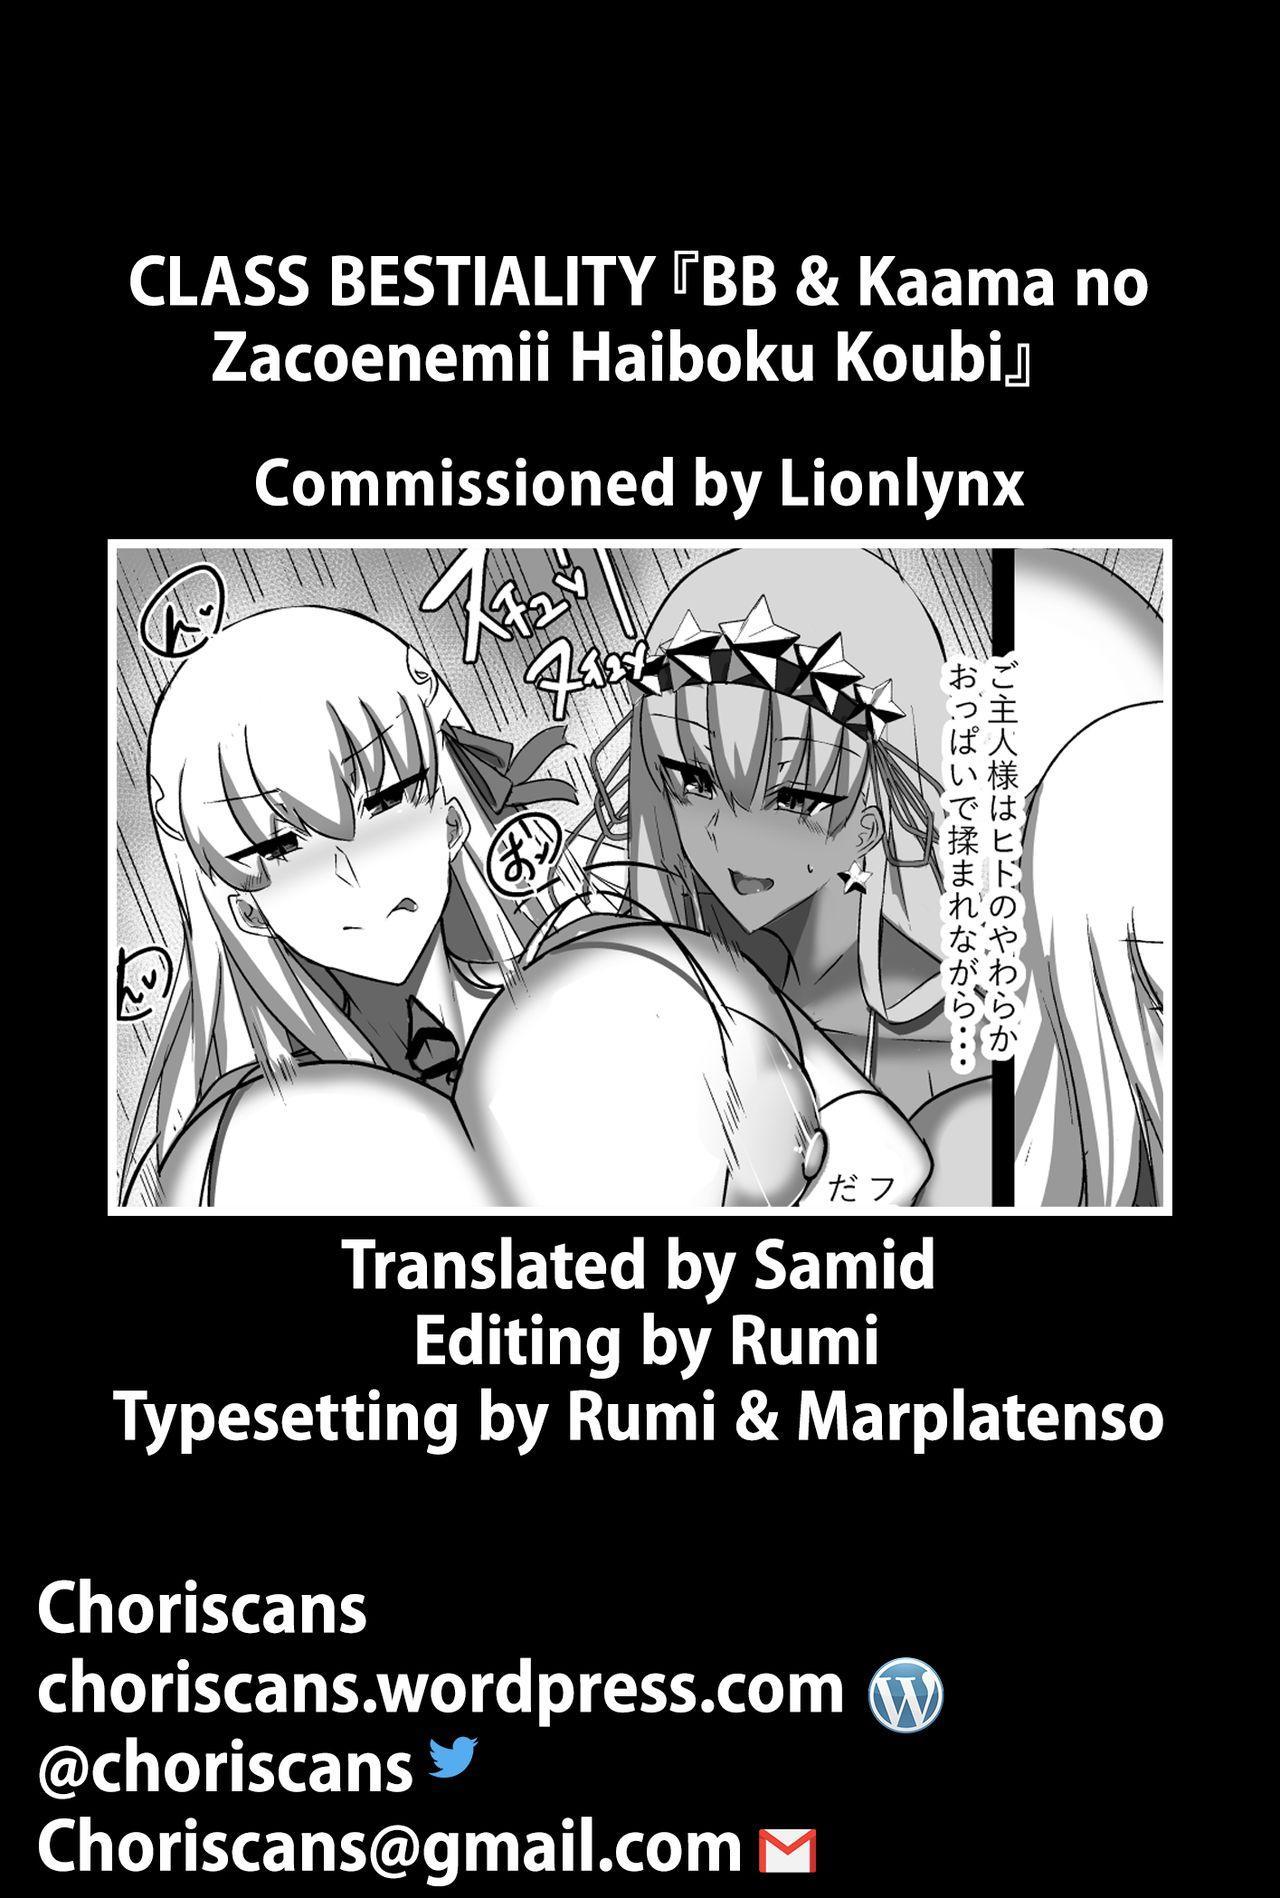 "CLASS BESTIALITY ""BB & Kama no Zako Enemy Haiboku Koubi Hen"" 26"